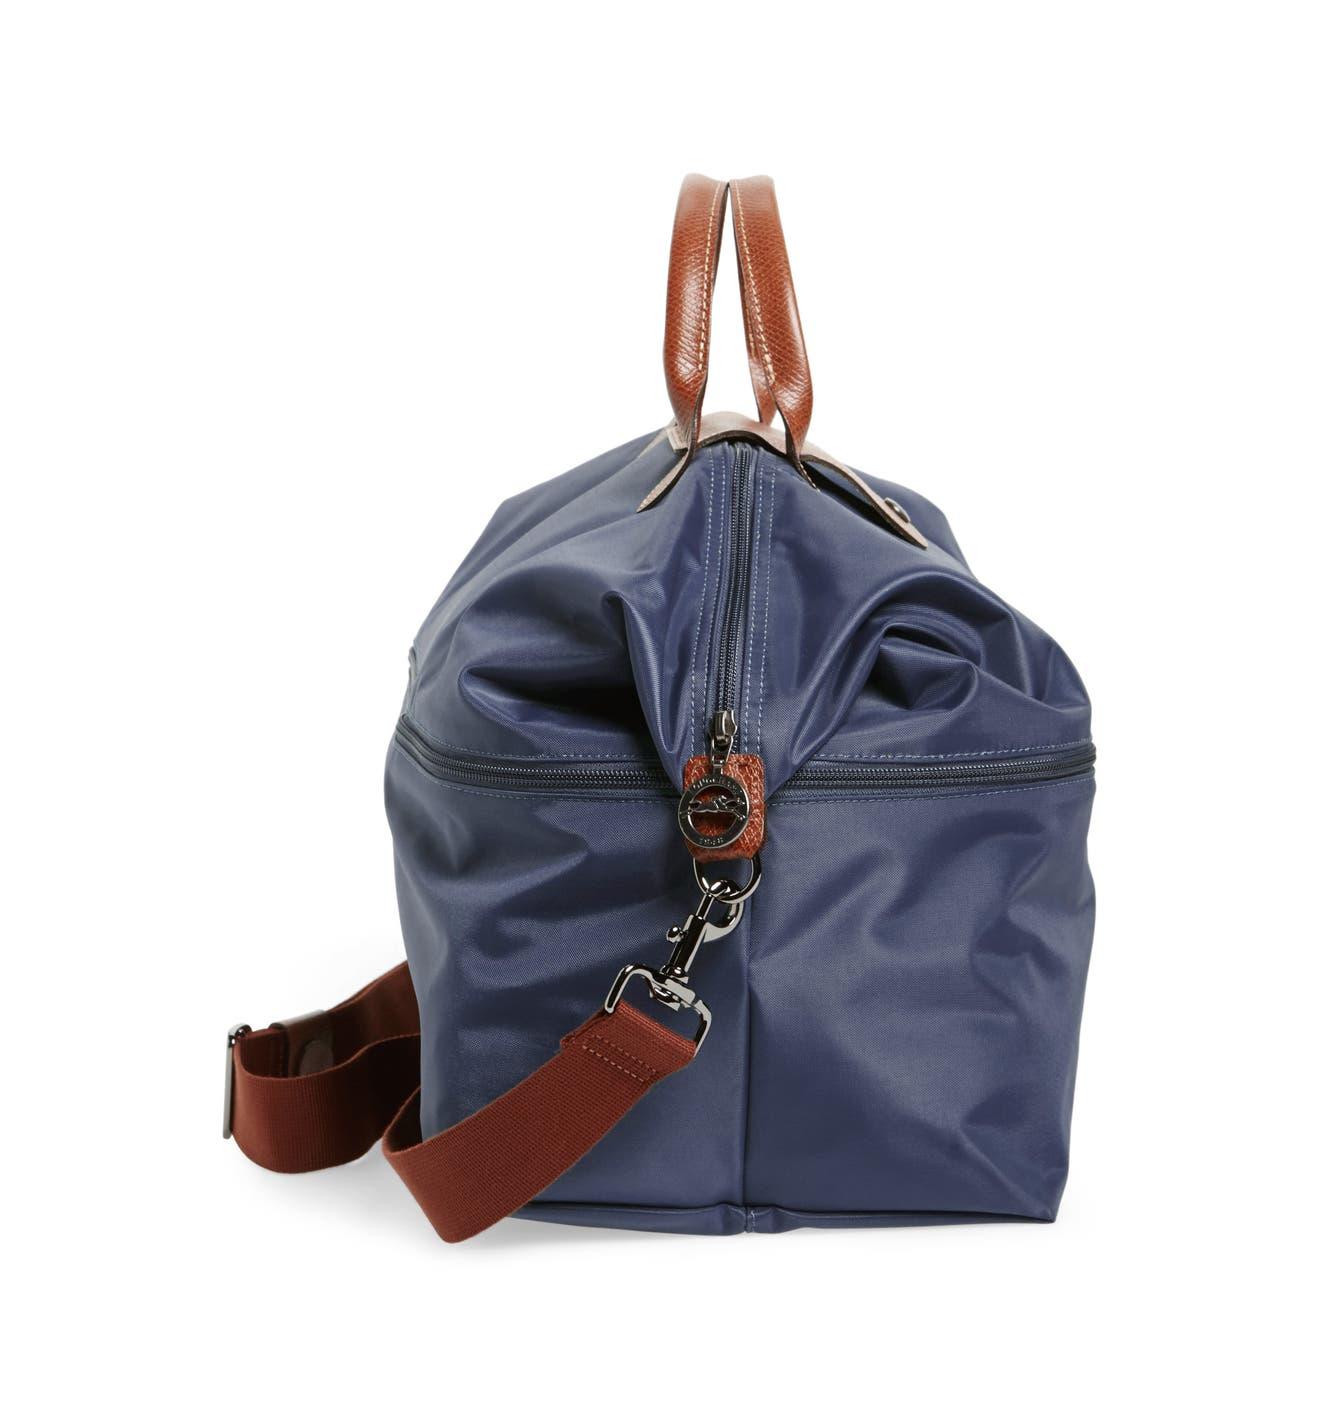 500c5427ba7a Longchamp Le Pliage Expandable Travel Bag Extra Large